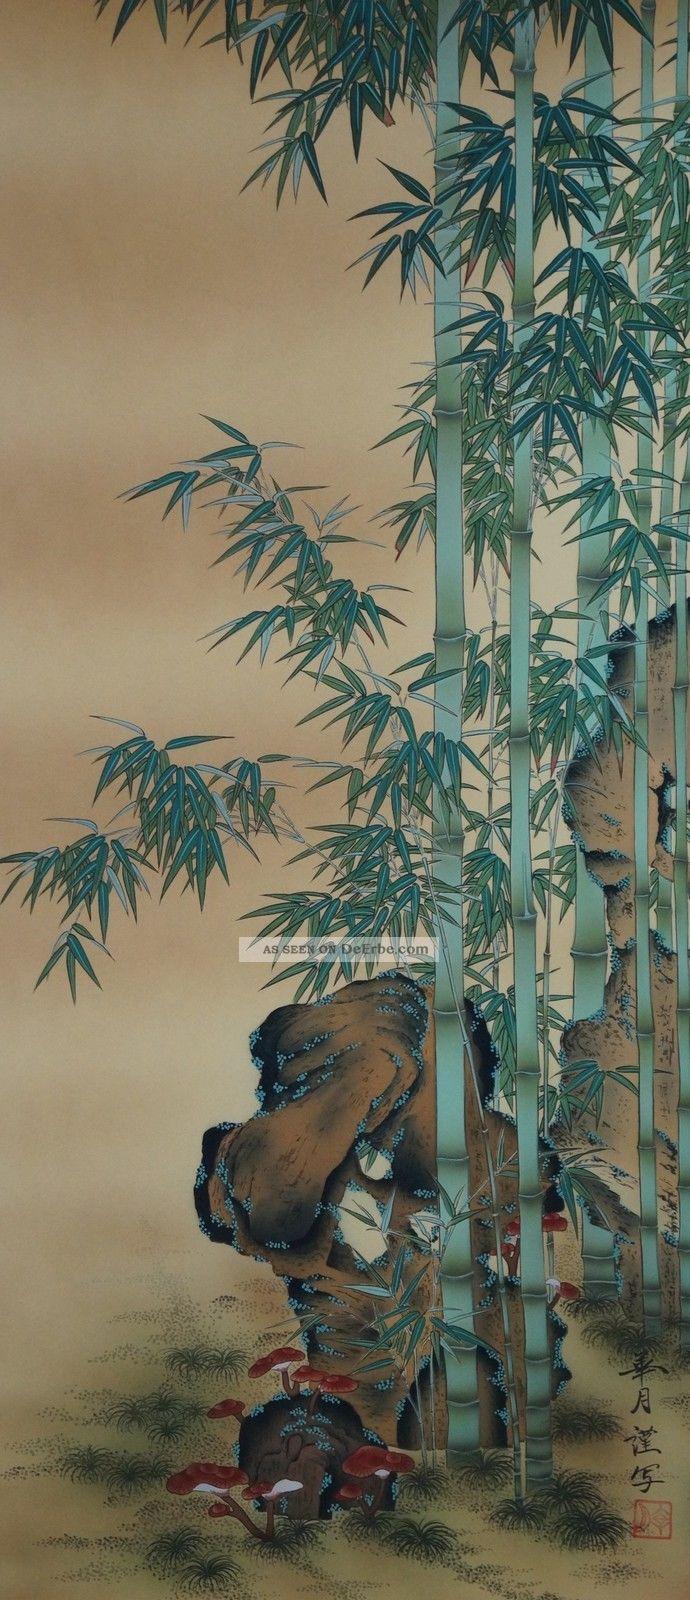 Antikes Japanisches Rollbild Kakejiku Bambus Japan Scroll 3553 Asiatika: Japan Bild